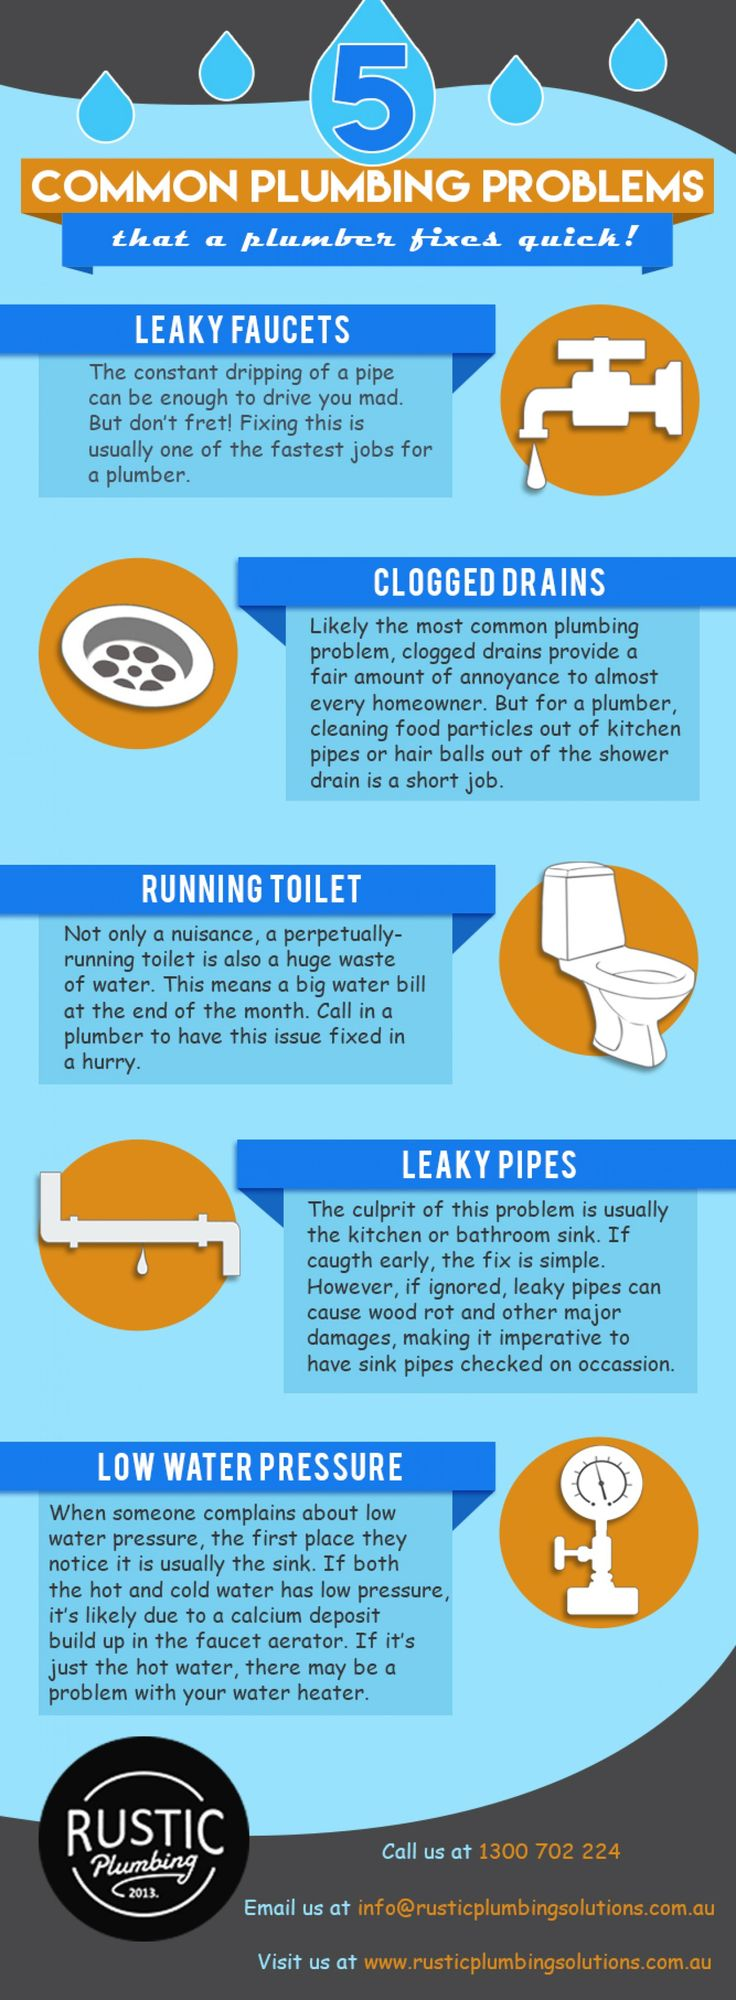 Top 5 Common Plumbing Problems Infographic